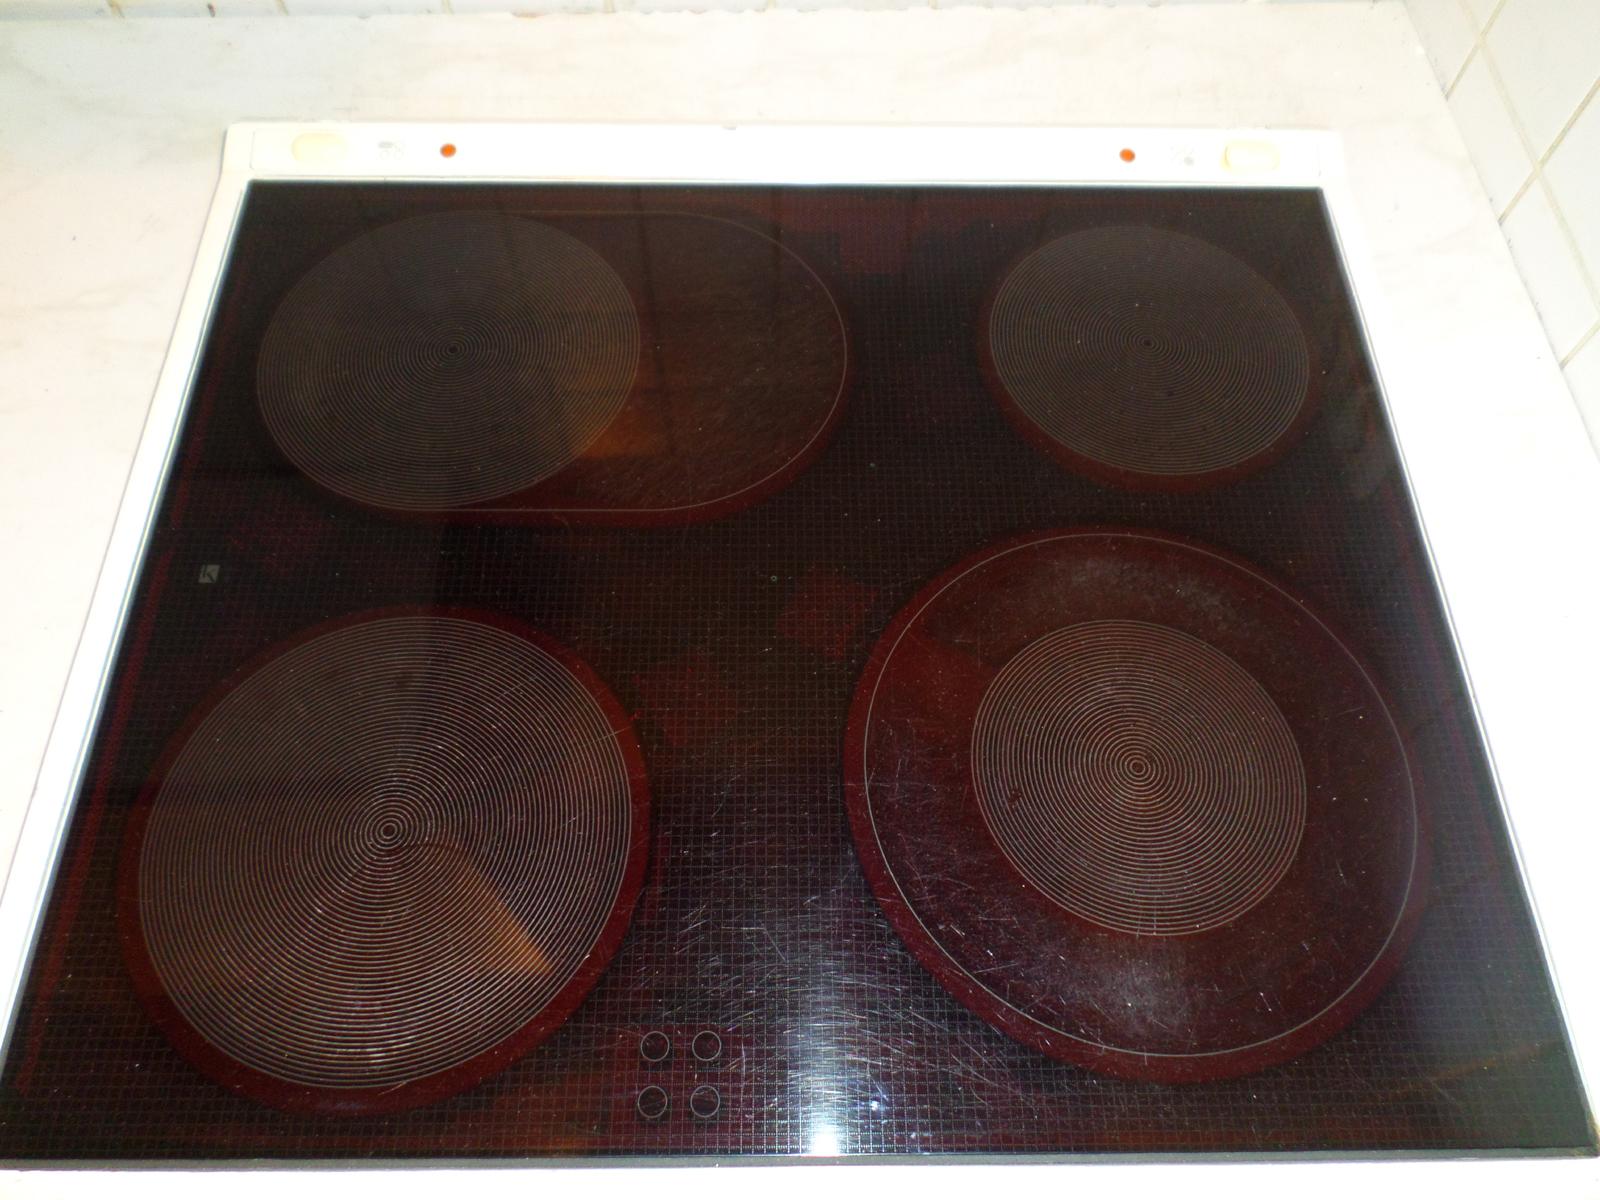 bosch ekt730 schott ceran glaskeramik ersatzglas. Black Bedroom Furniture Sets. Home Design Ideas